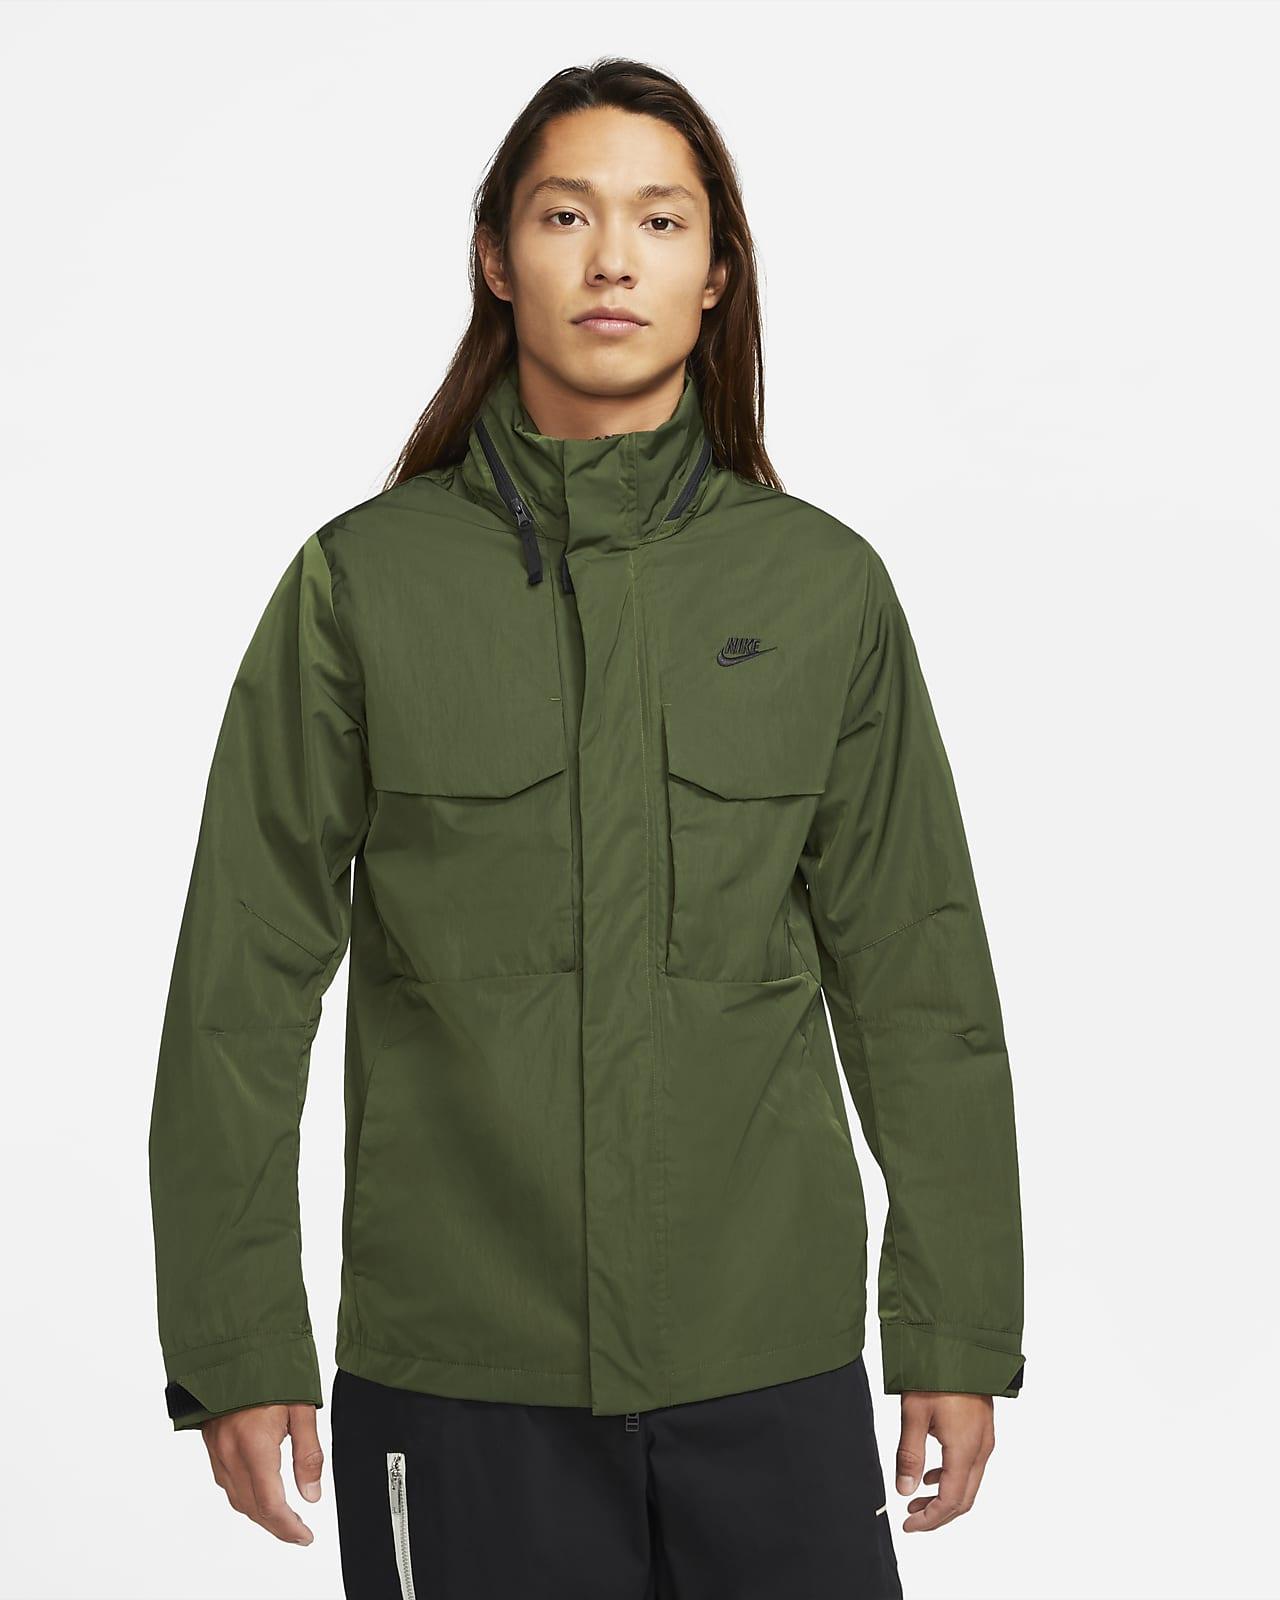 Nike Sportswear Premium Essentials Men's Unlined Hooded M65 Jacket